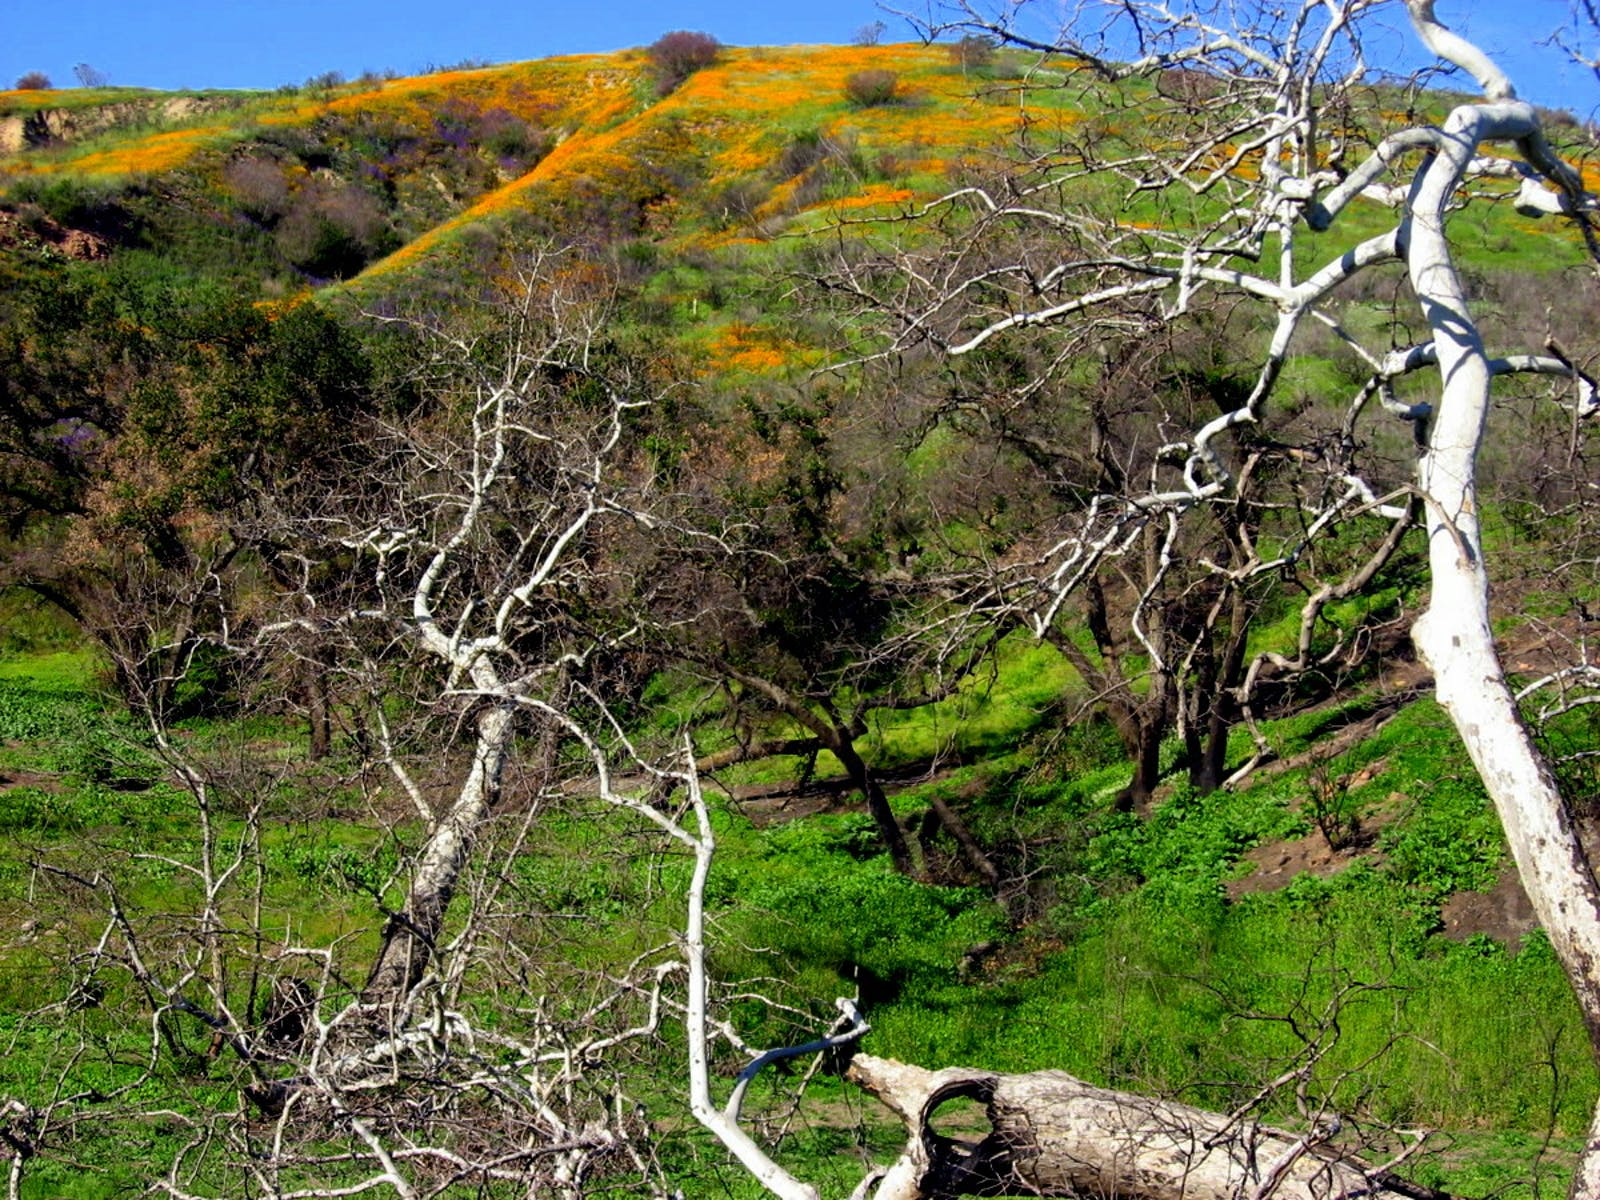 California Coastal Sage and Chaparral